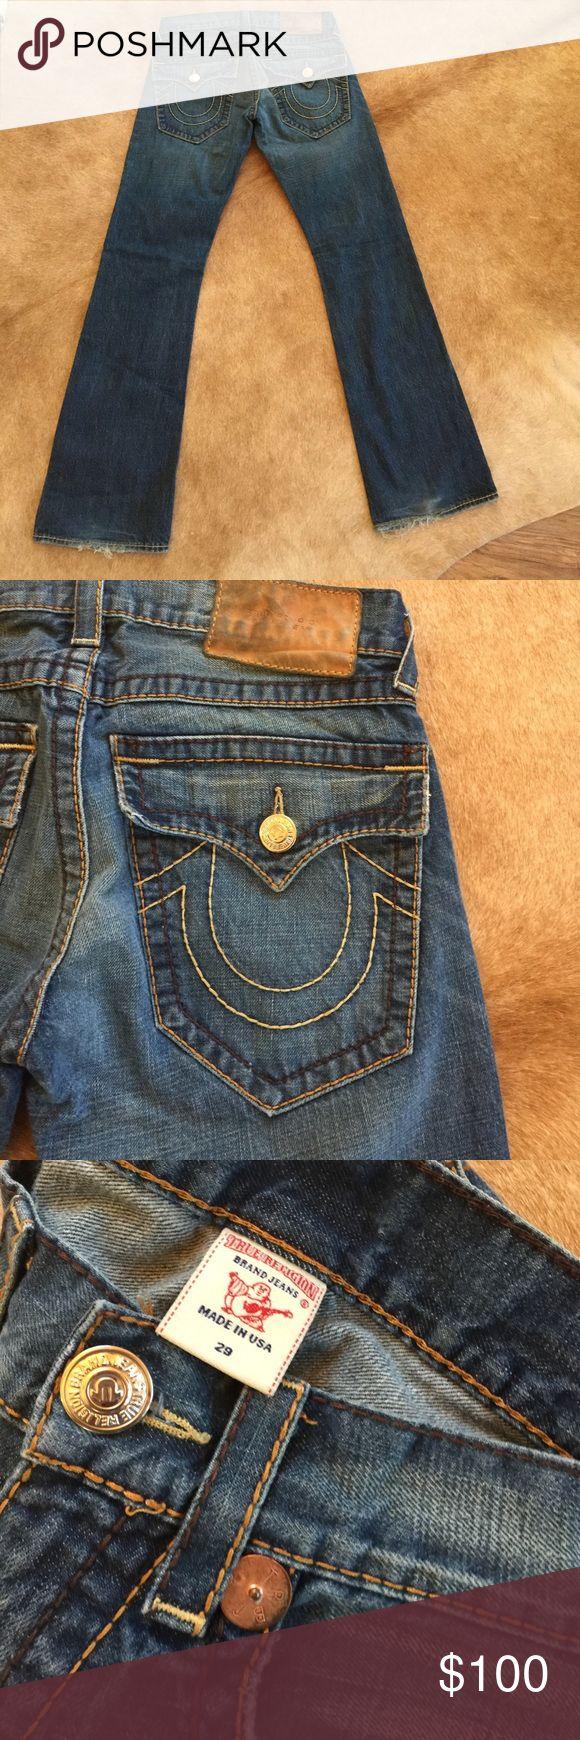 True Religion Brand Jeans size 29 Men's true Religion jeans True Religion Jeans Bootcut